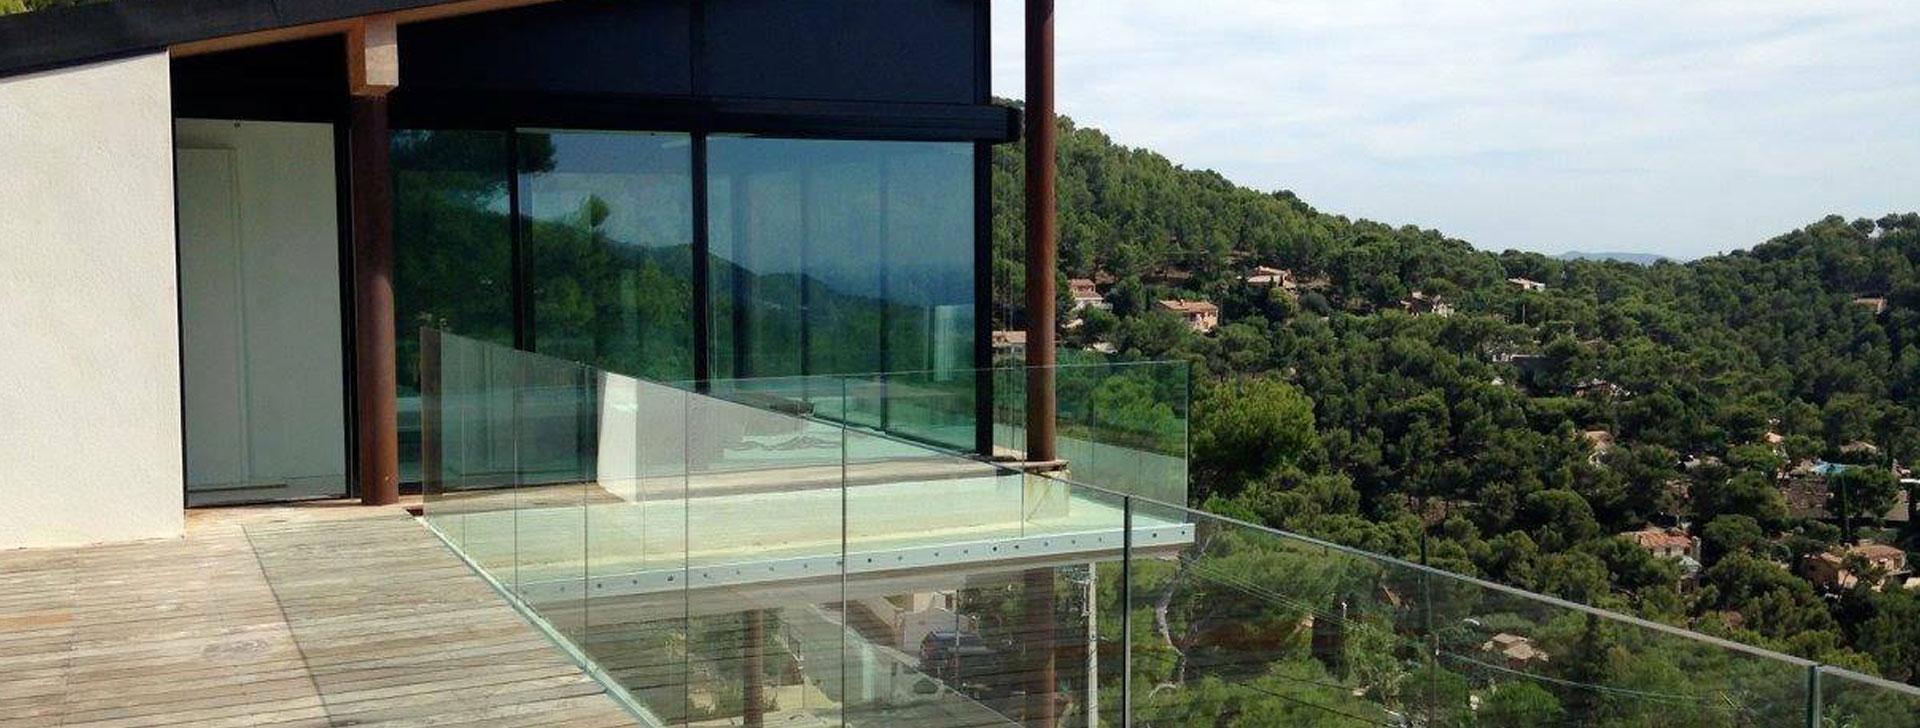 veranda vitre great with veranda vitre vranda en aluminium tout verre with veranda vitre. Black Bedroom Furniture Sets. Home Design Ideas